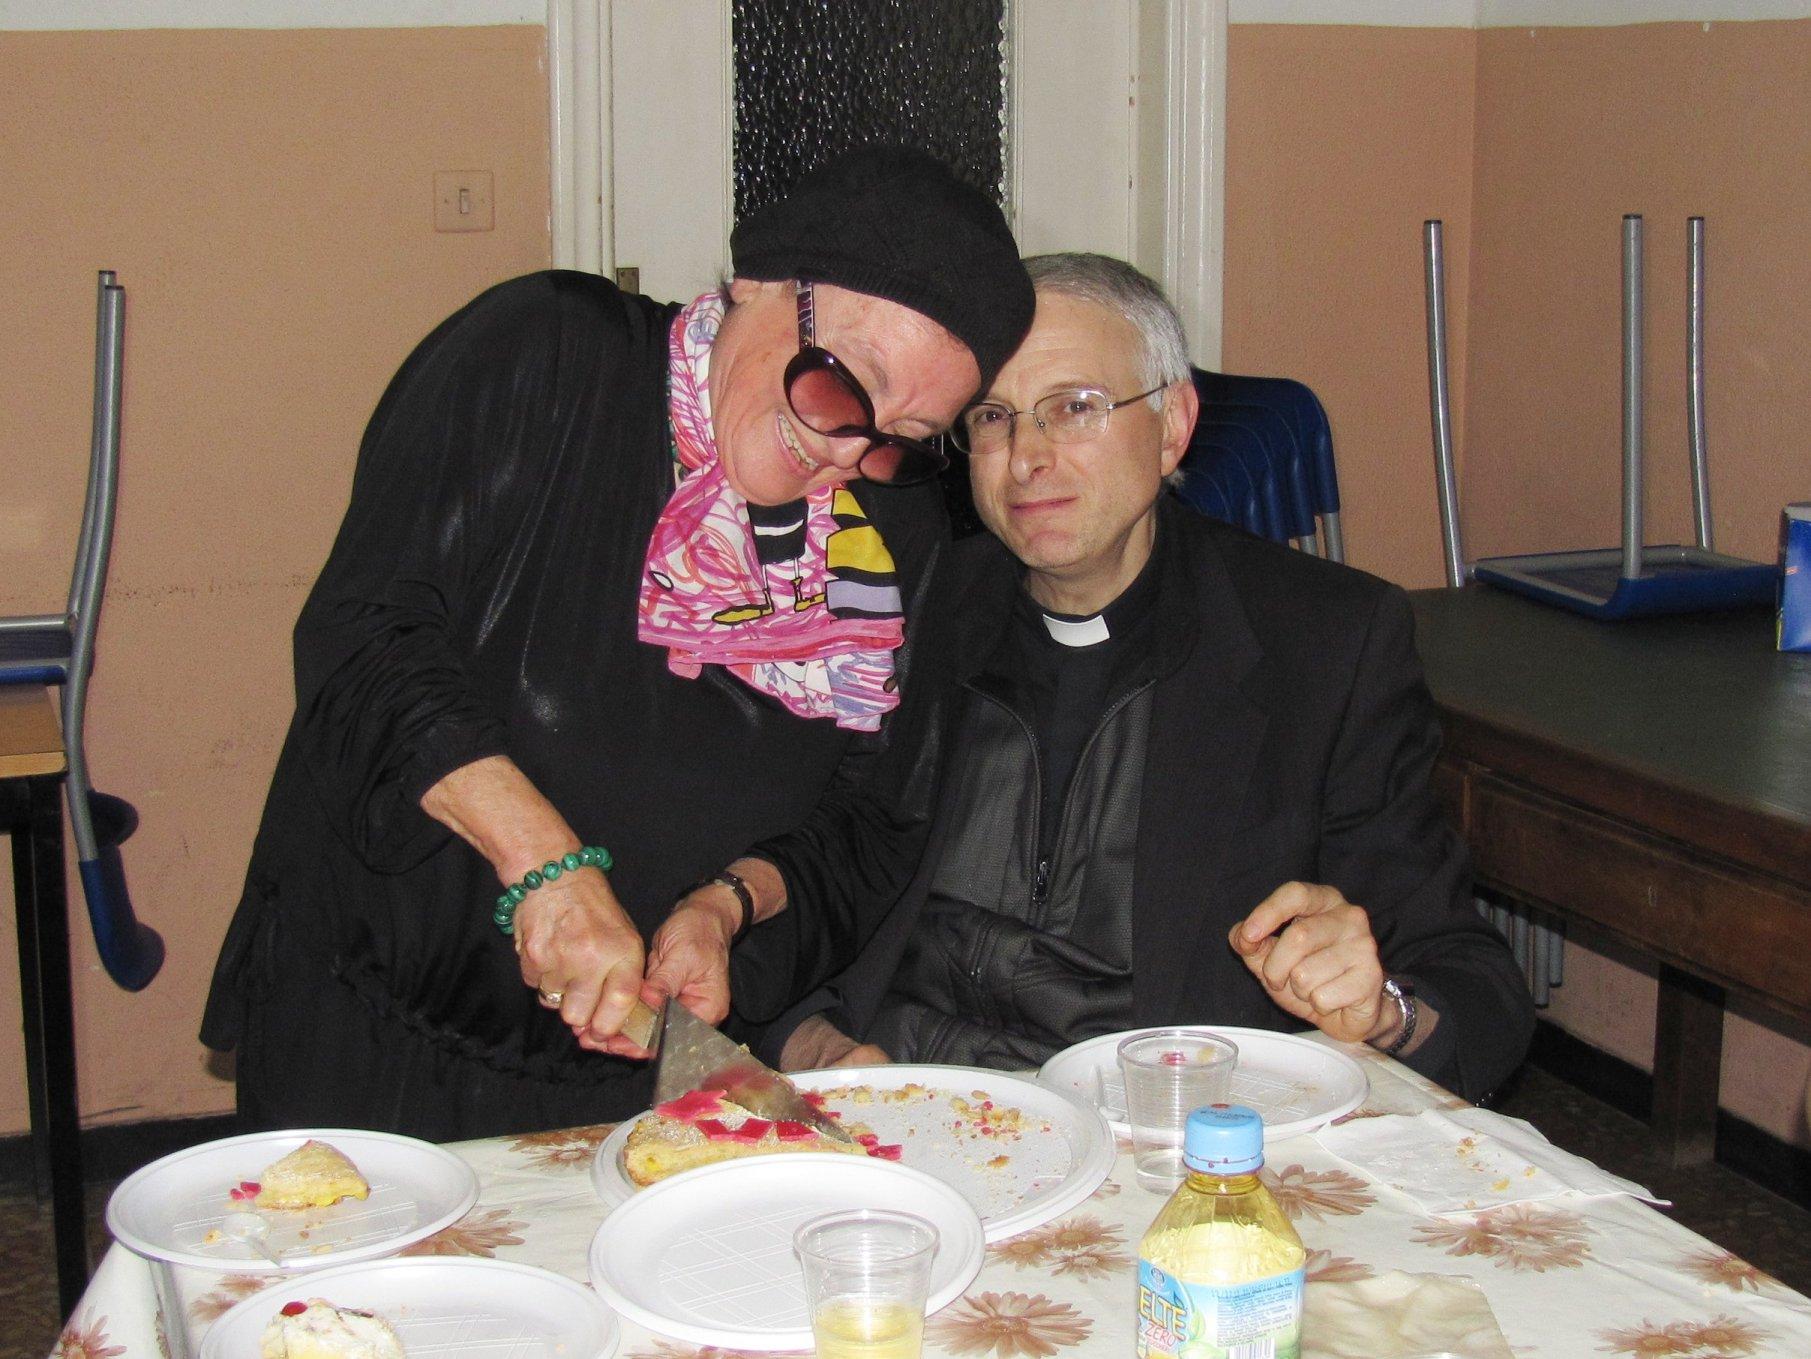 verifica_catechiste_2012-06-11-20-00-03